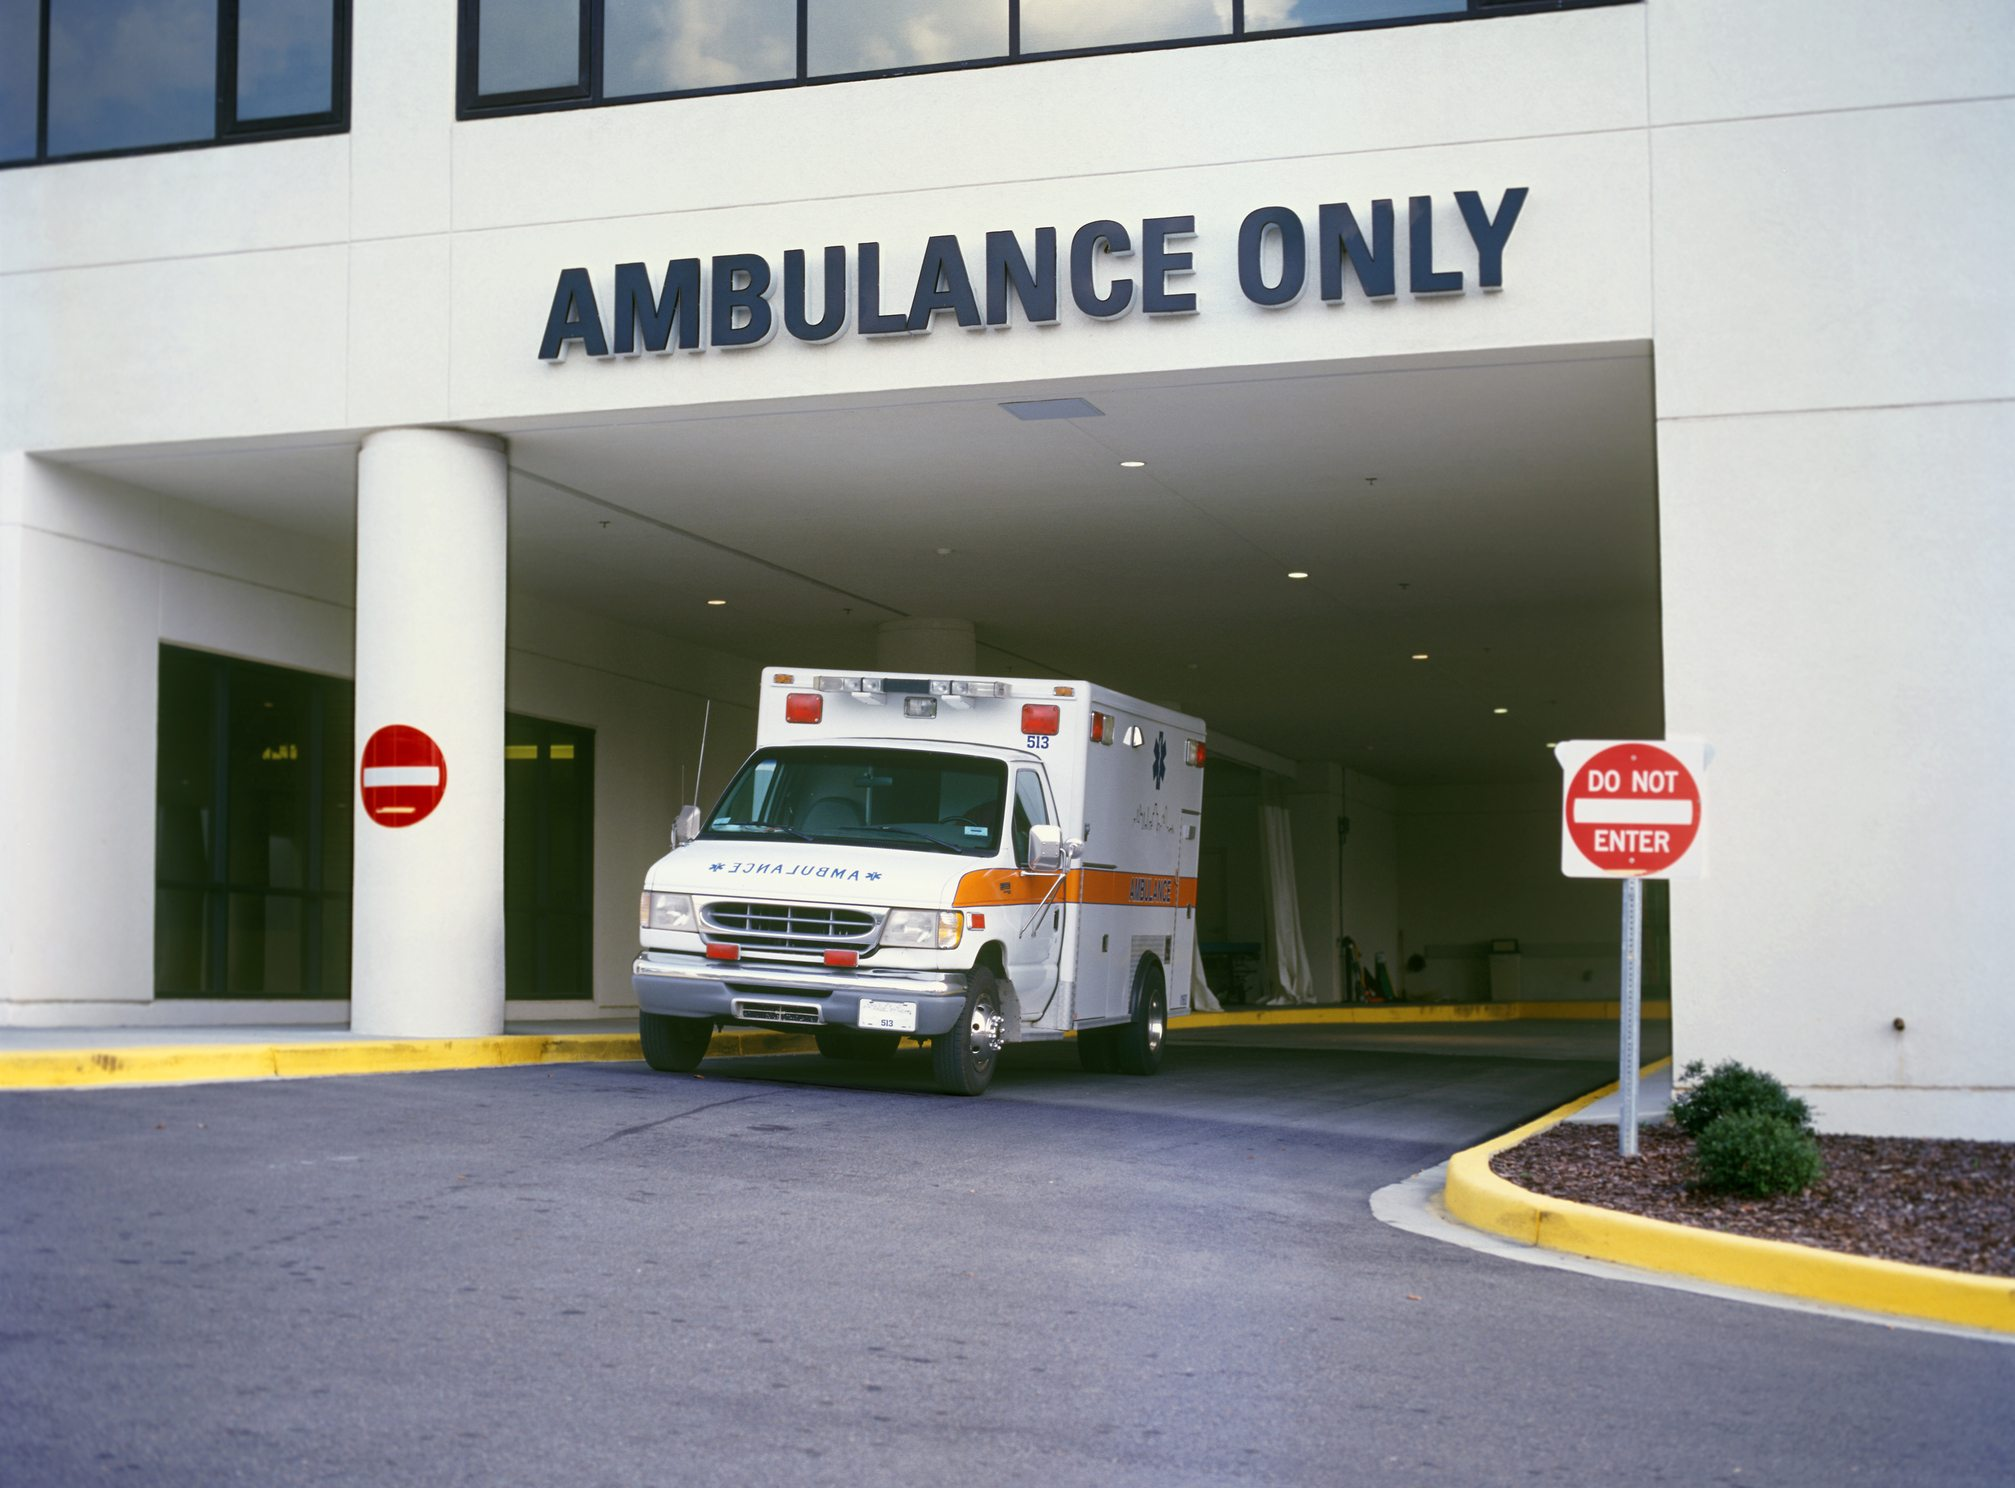 Ambulance at Emergency Room entrance